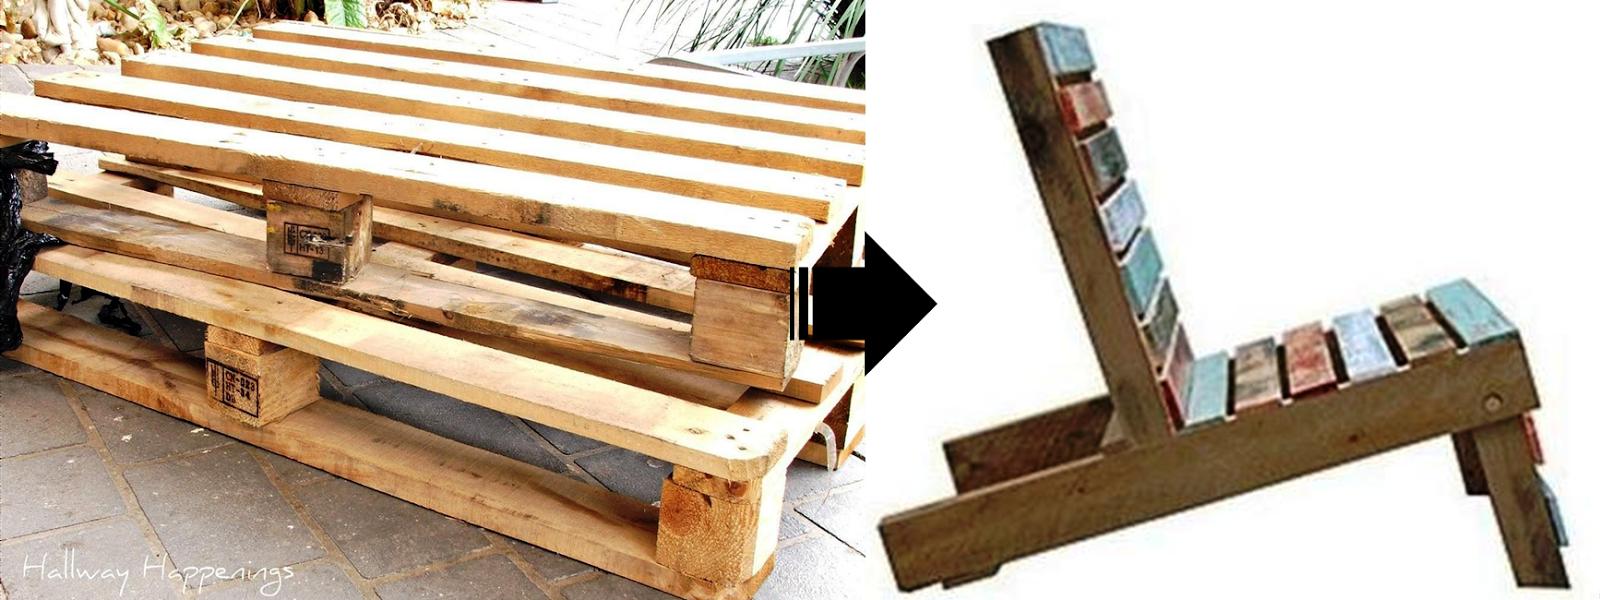 Tu hogar dulce hogar convierte tablones de madera en - Tablones de madera baratos ...